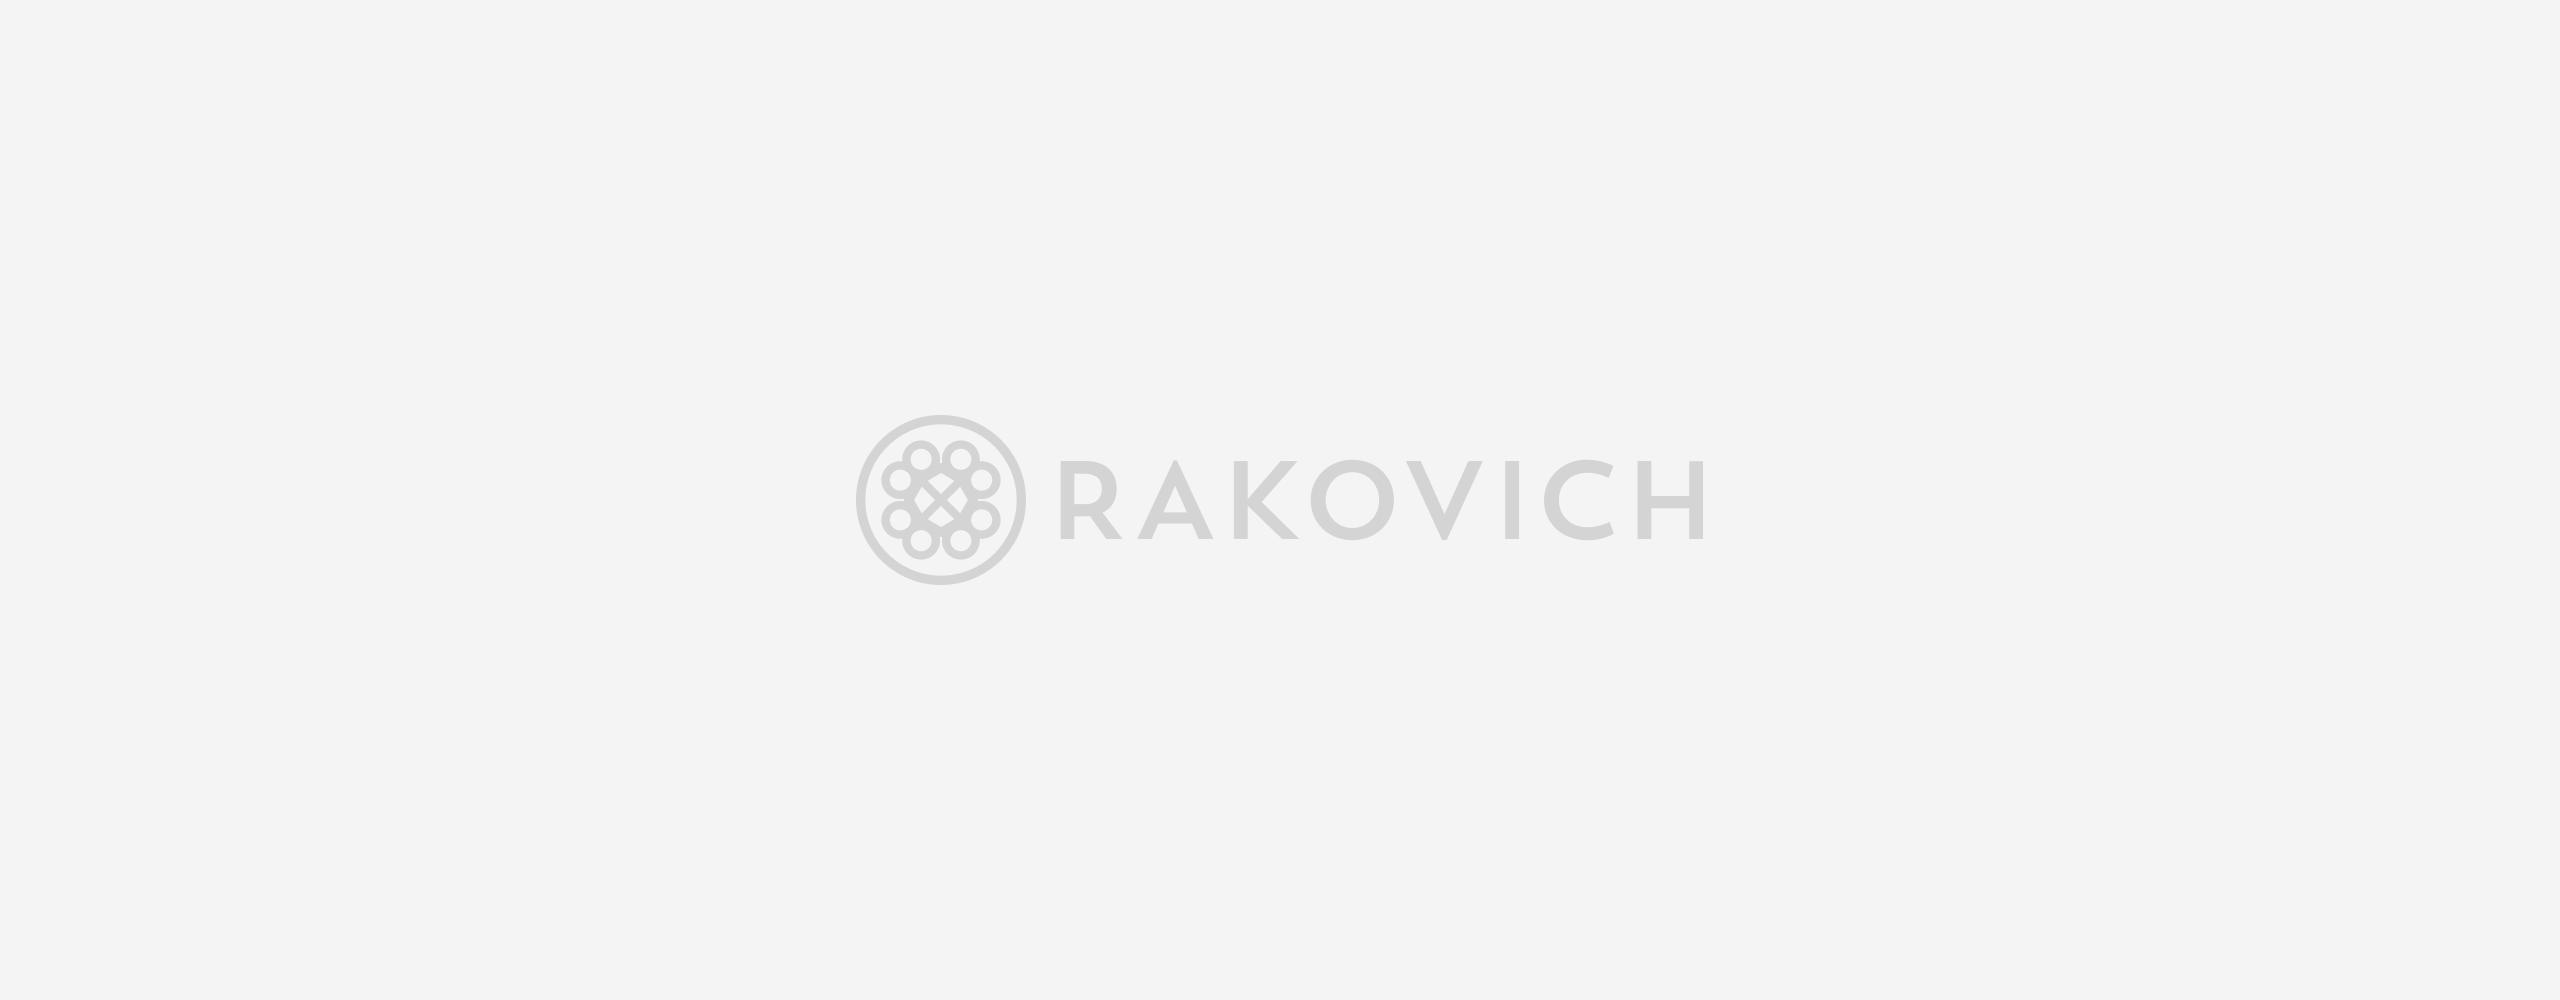 Логотип Rakovich